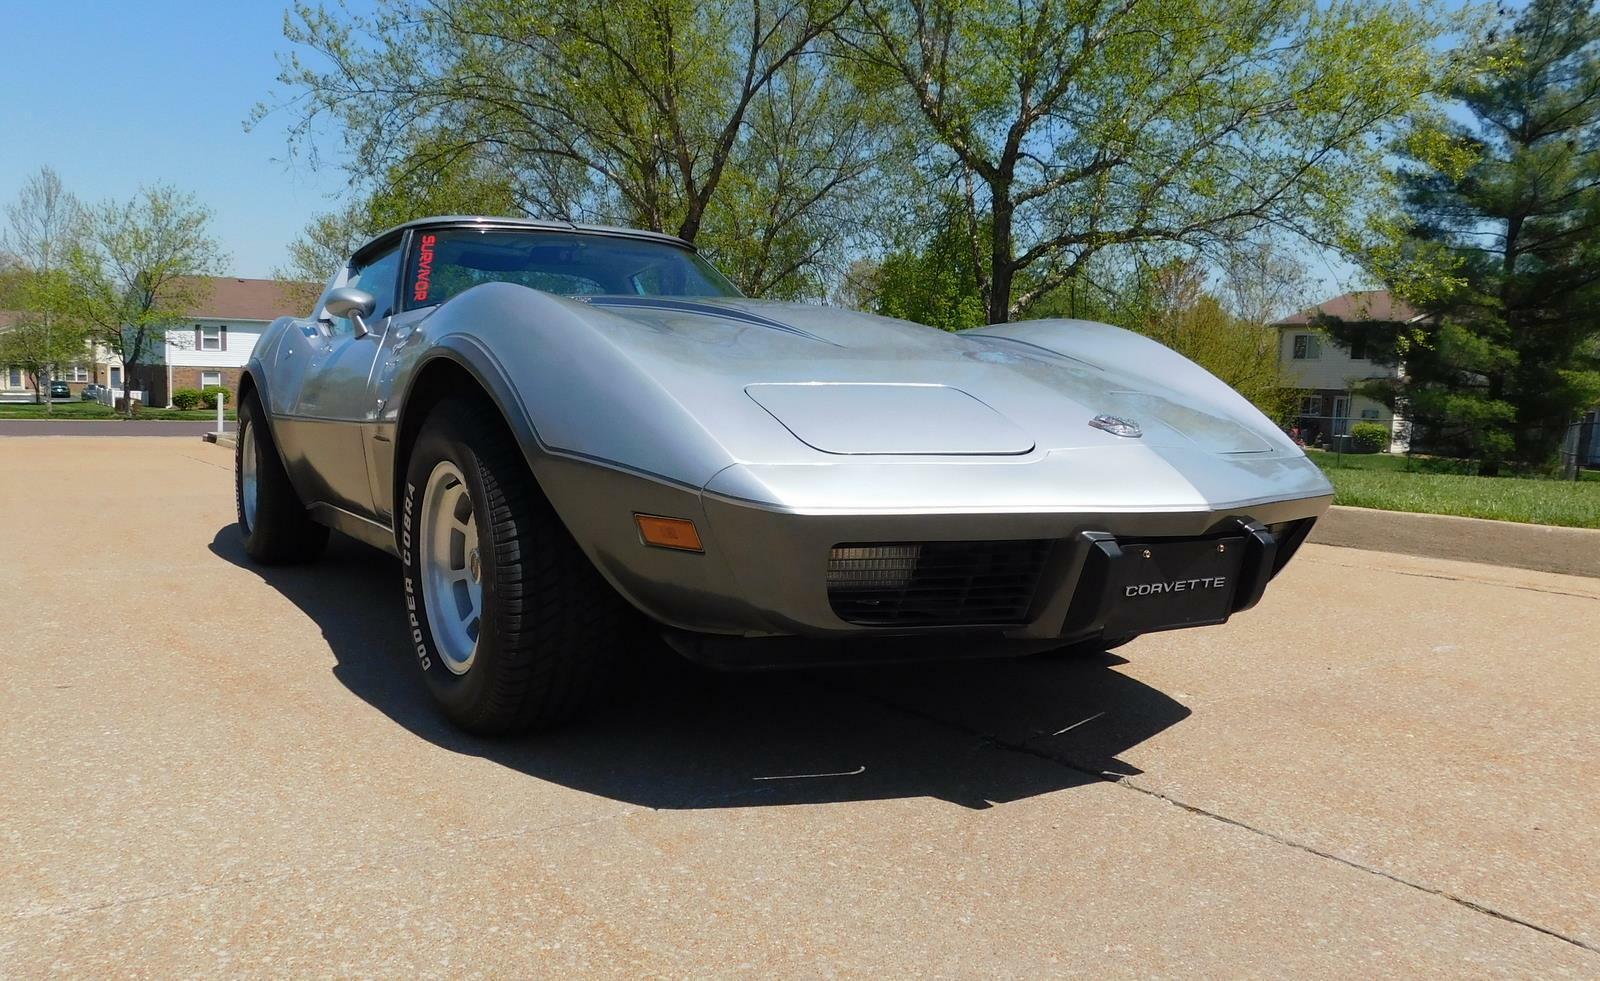 1978 Silver Chevrolet Corvette  L82 | C3 Corvette Photo 3